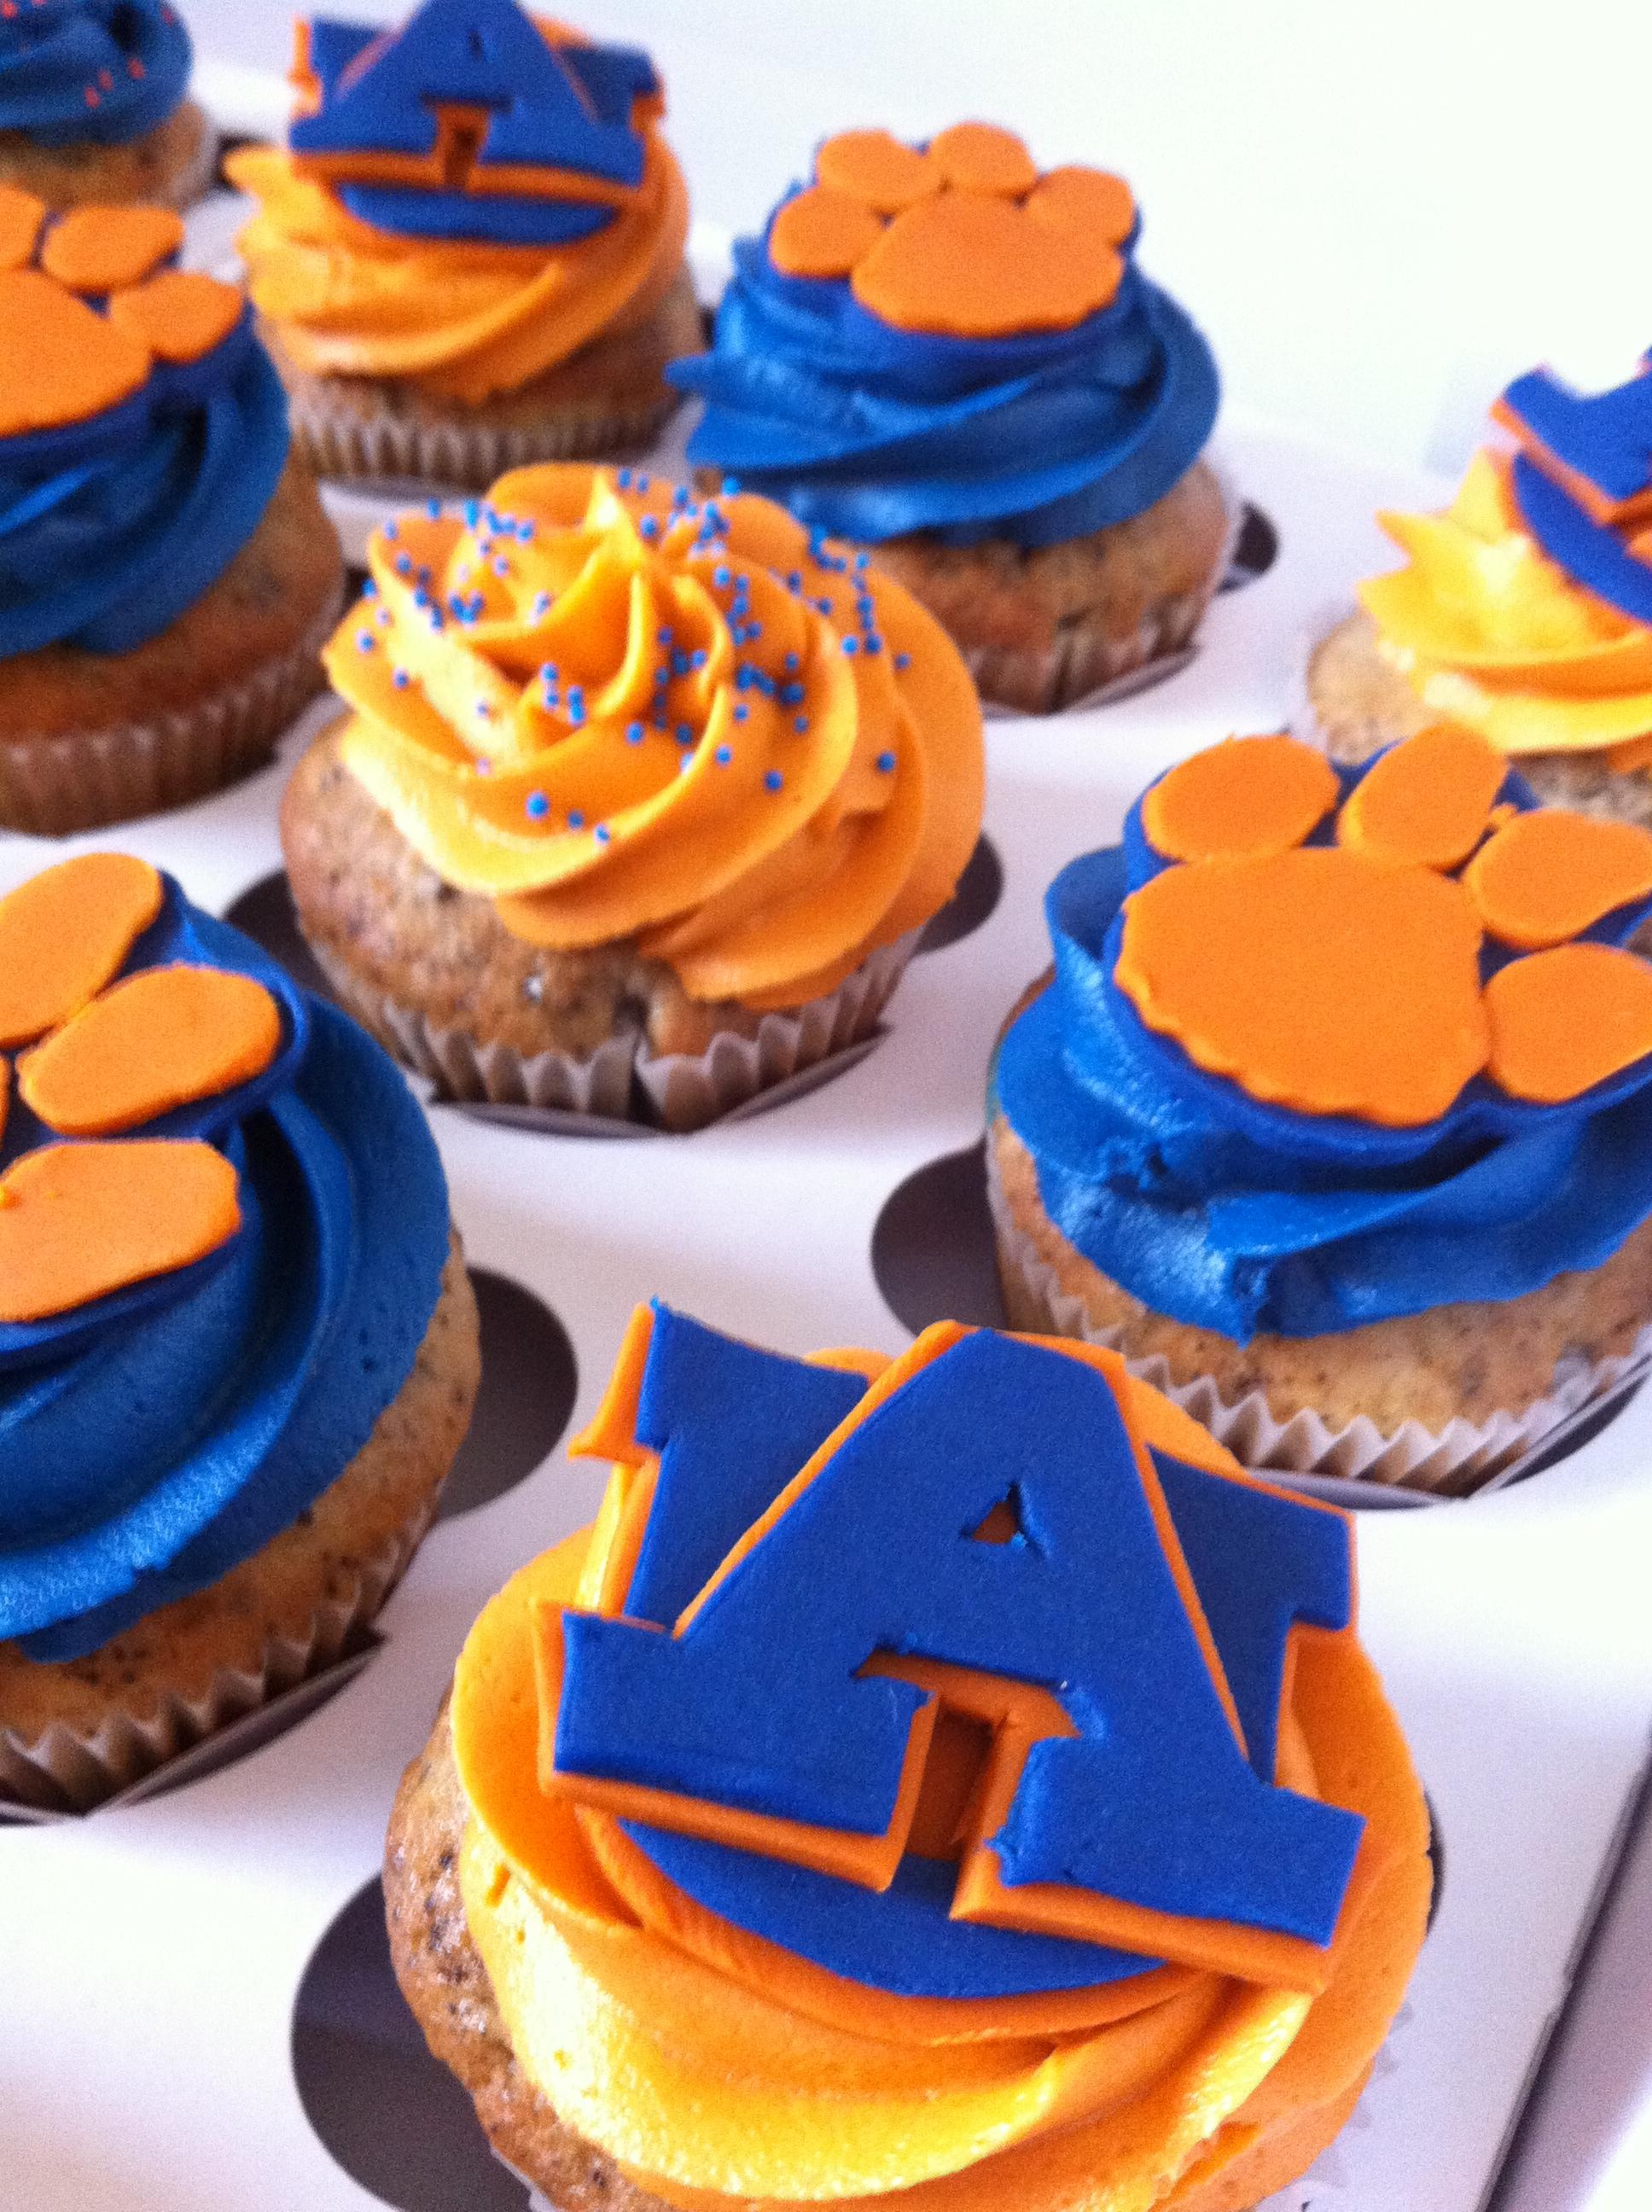 9 Photos of University Themed Cupcakes